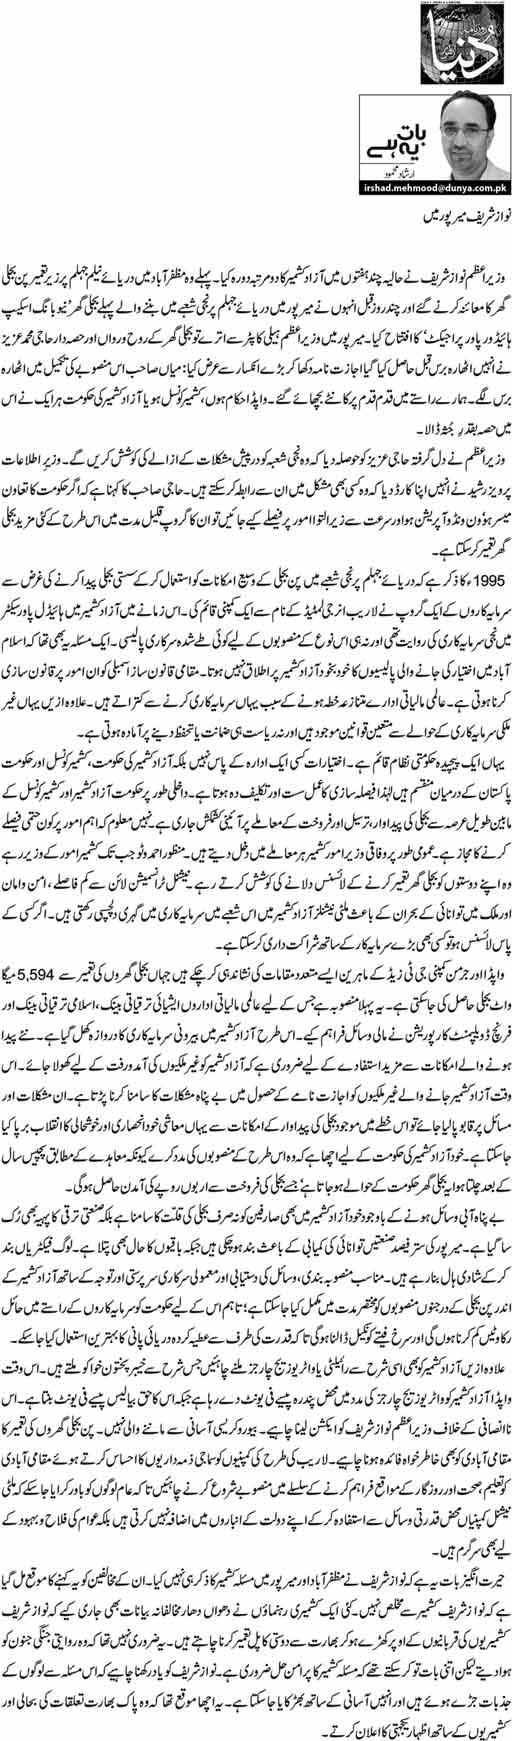 Nawaz Sharif Mirpur Main - Irshad Mehmood